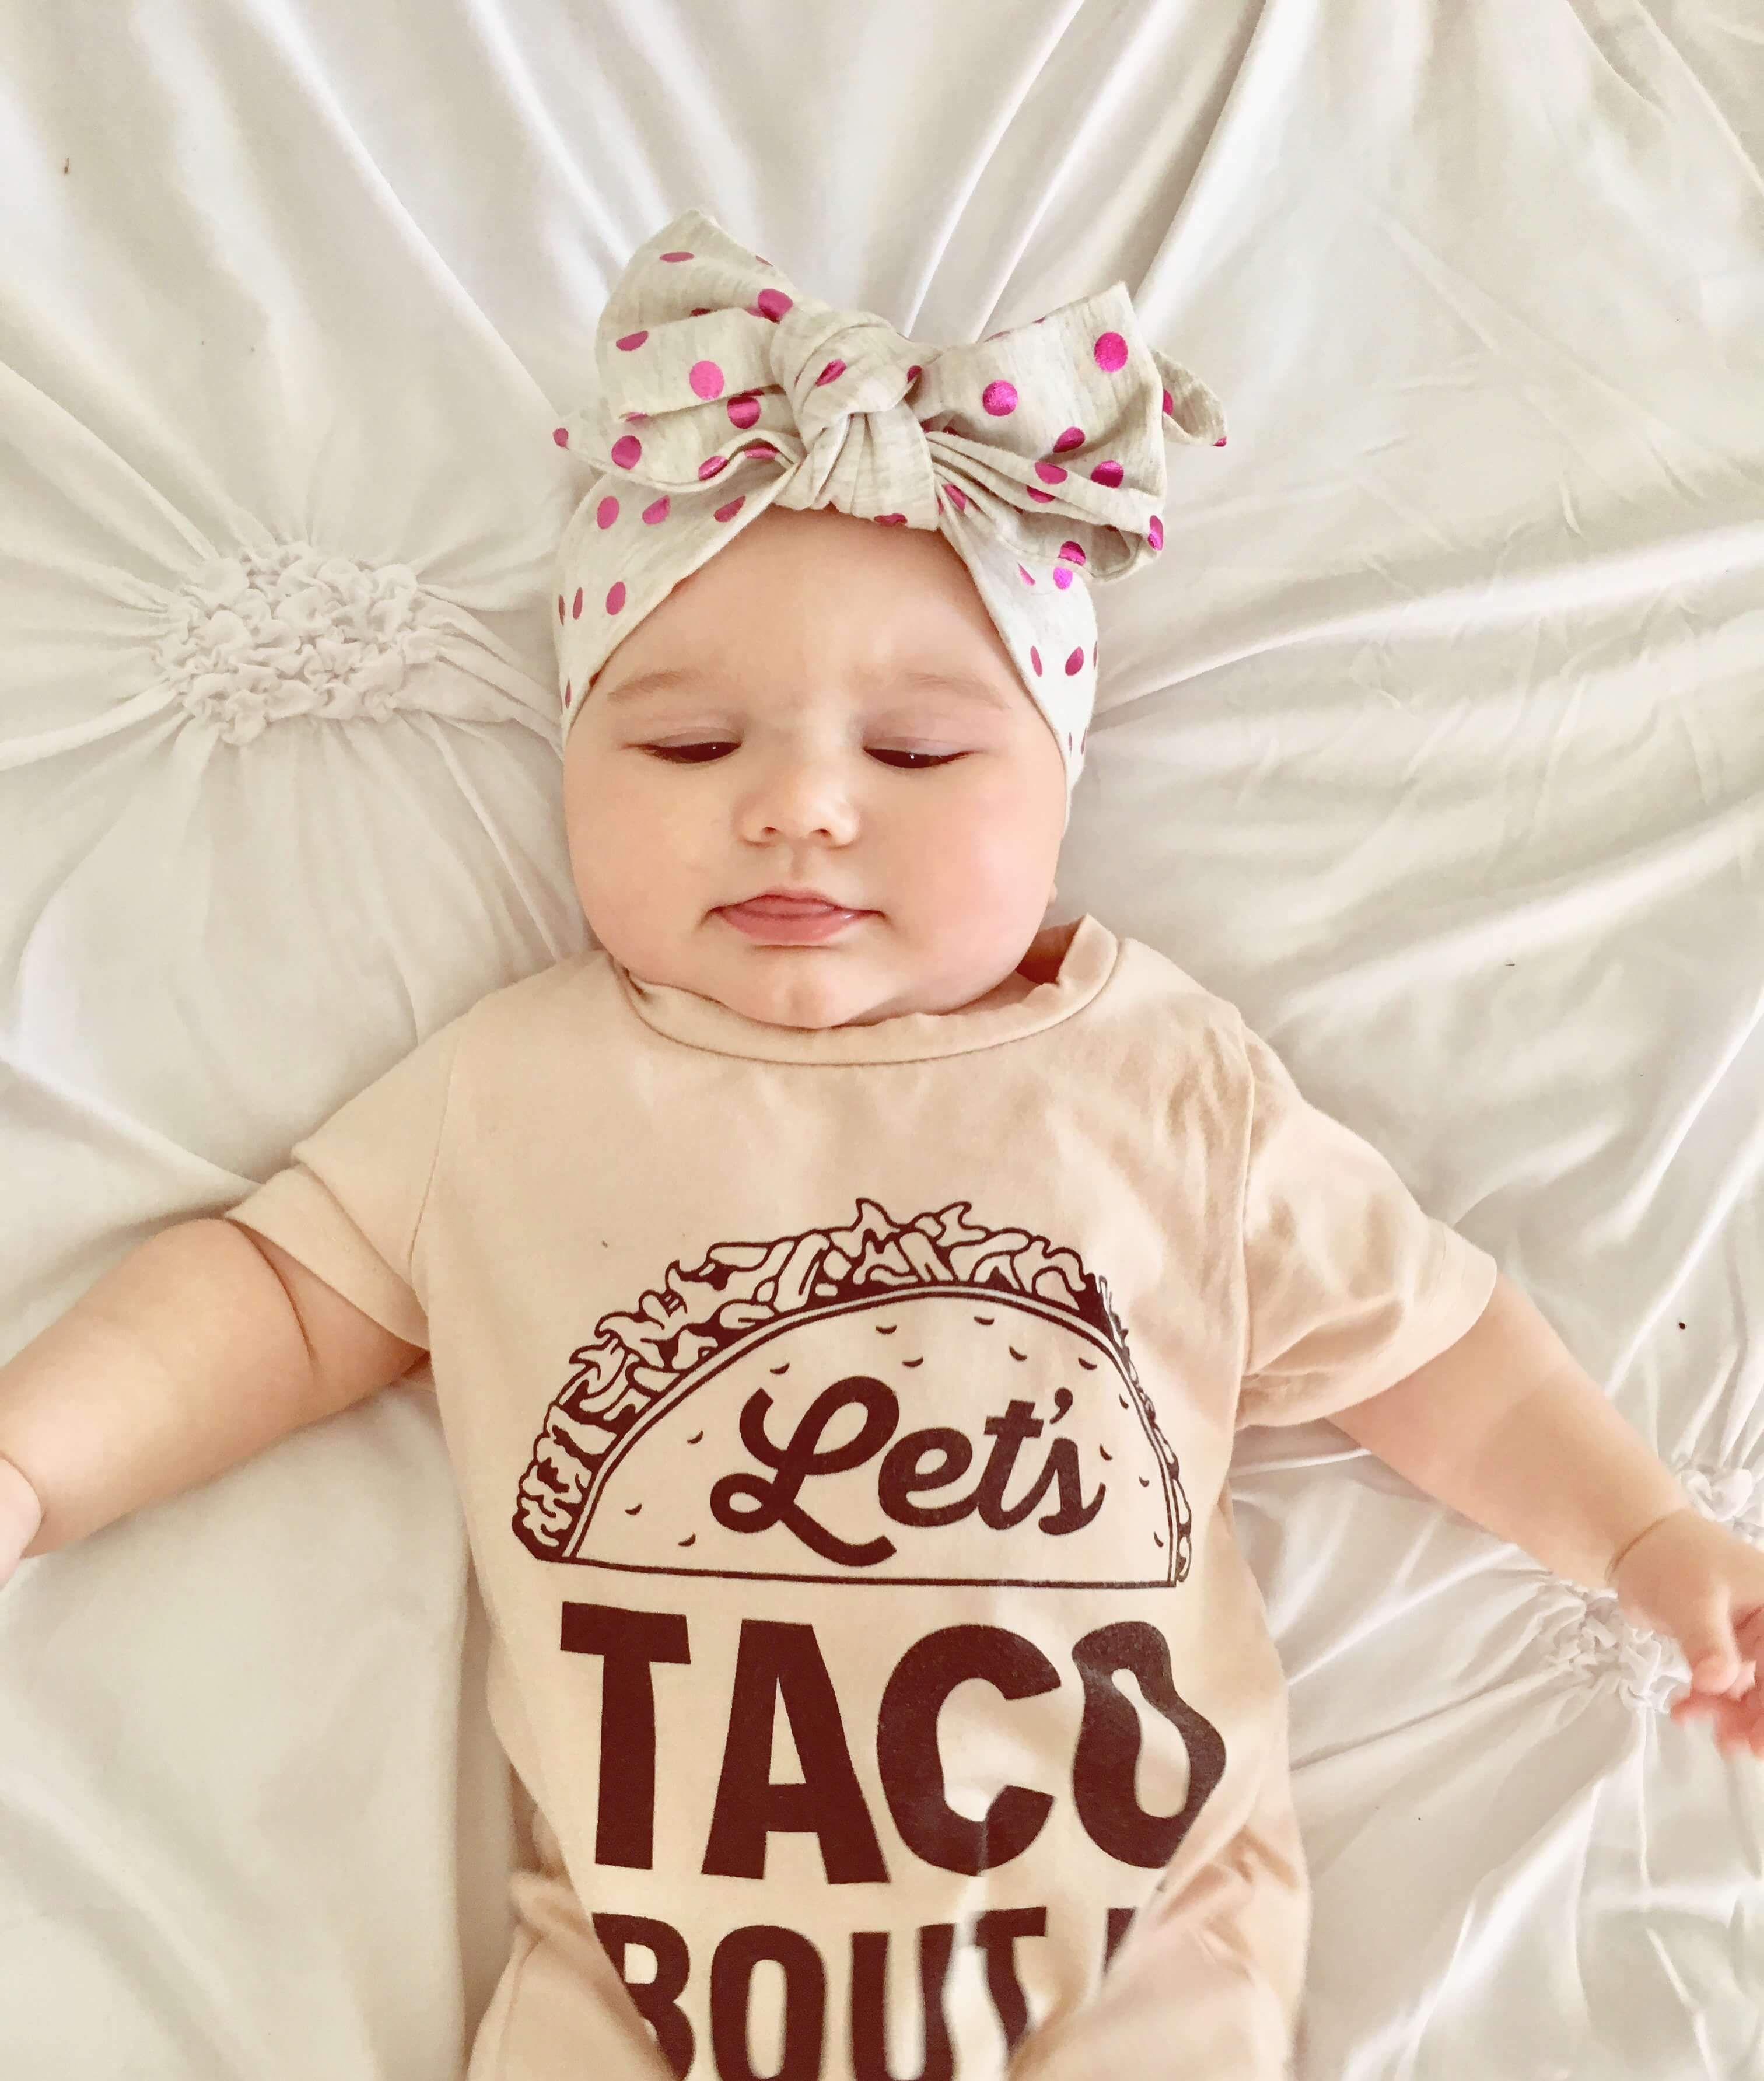 18941f78a Taco Time Jumpsuit. Let s taco bout it! Fun statement jumpsuit ...